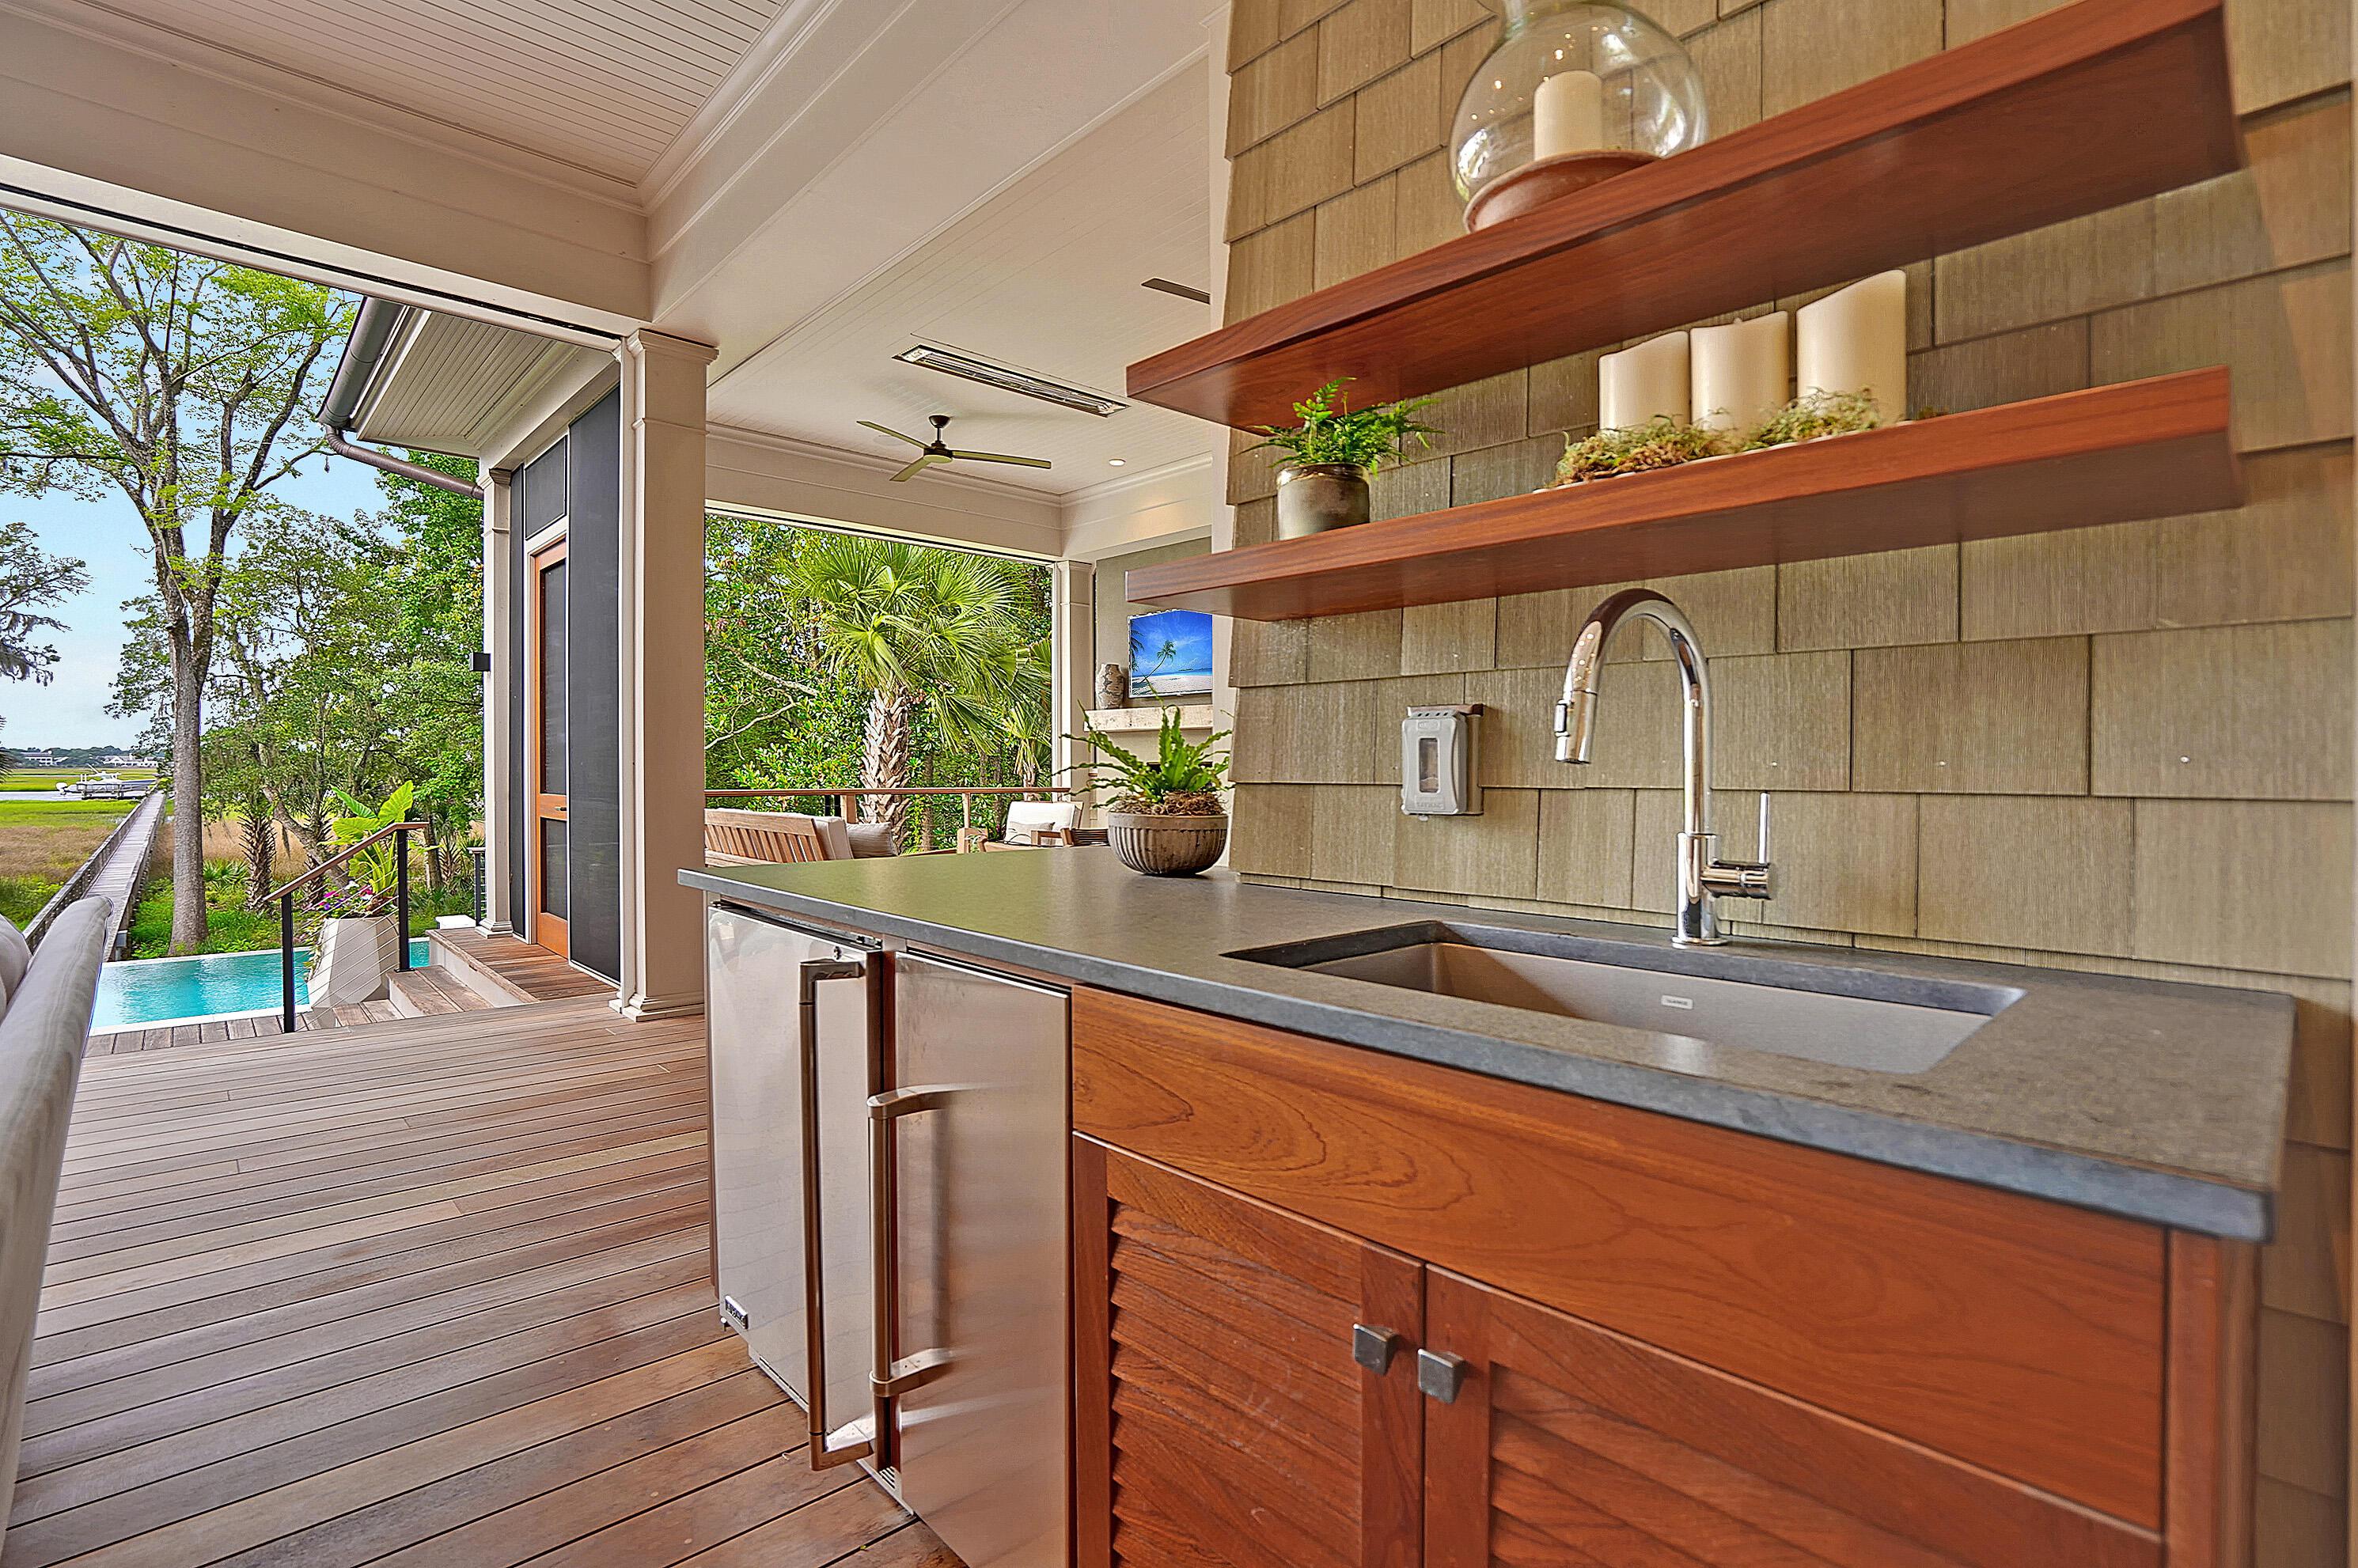 Beresford Hall Homes For Sale - 621 Barbados, Charleston, SC - 70